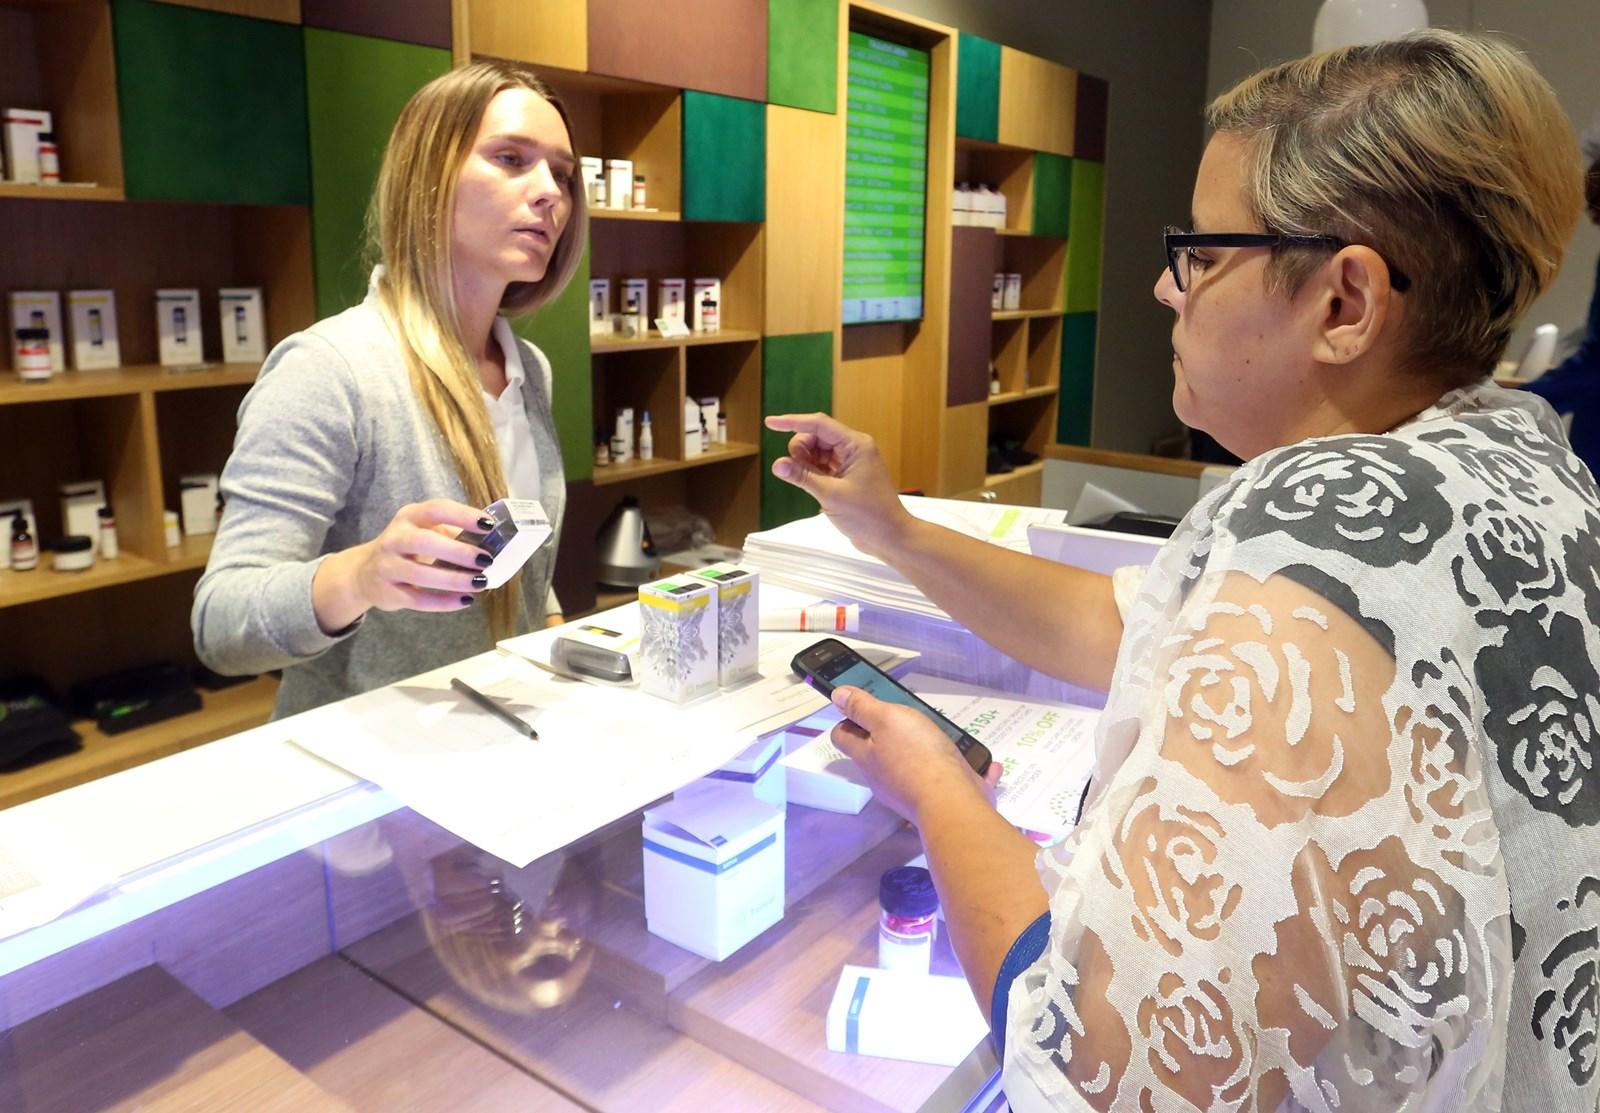 Insiders: State's fledgling medical marijuana industry